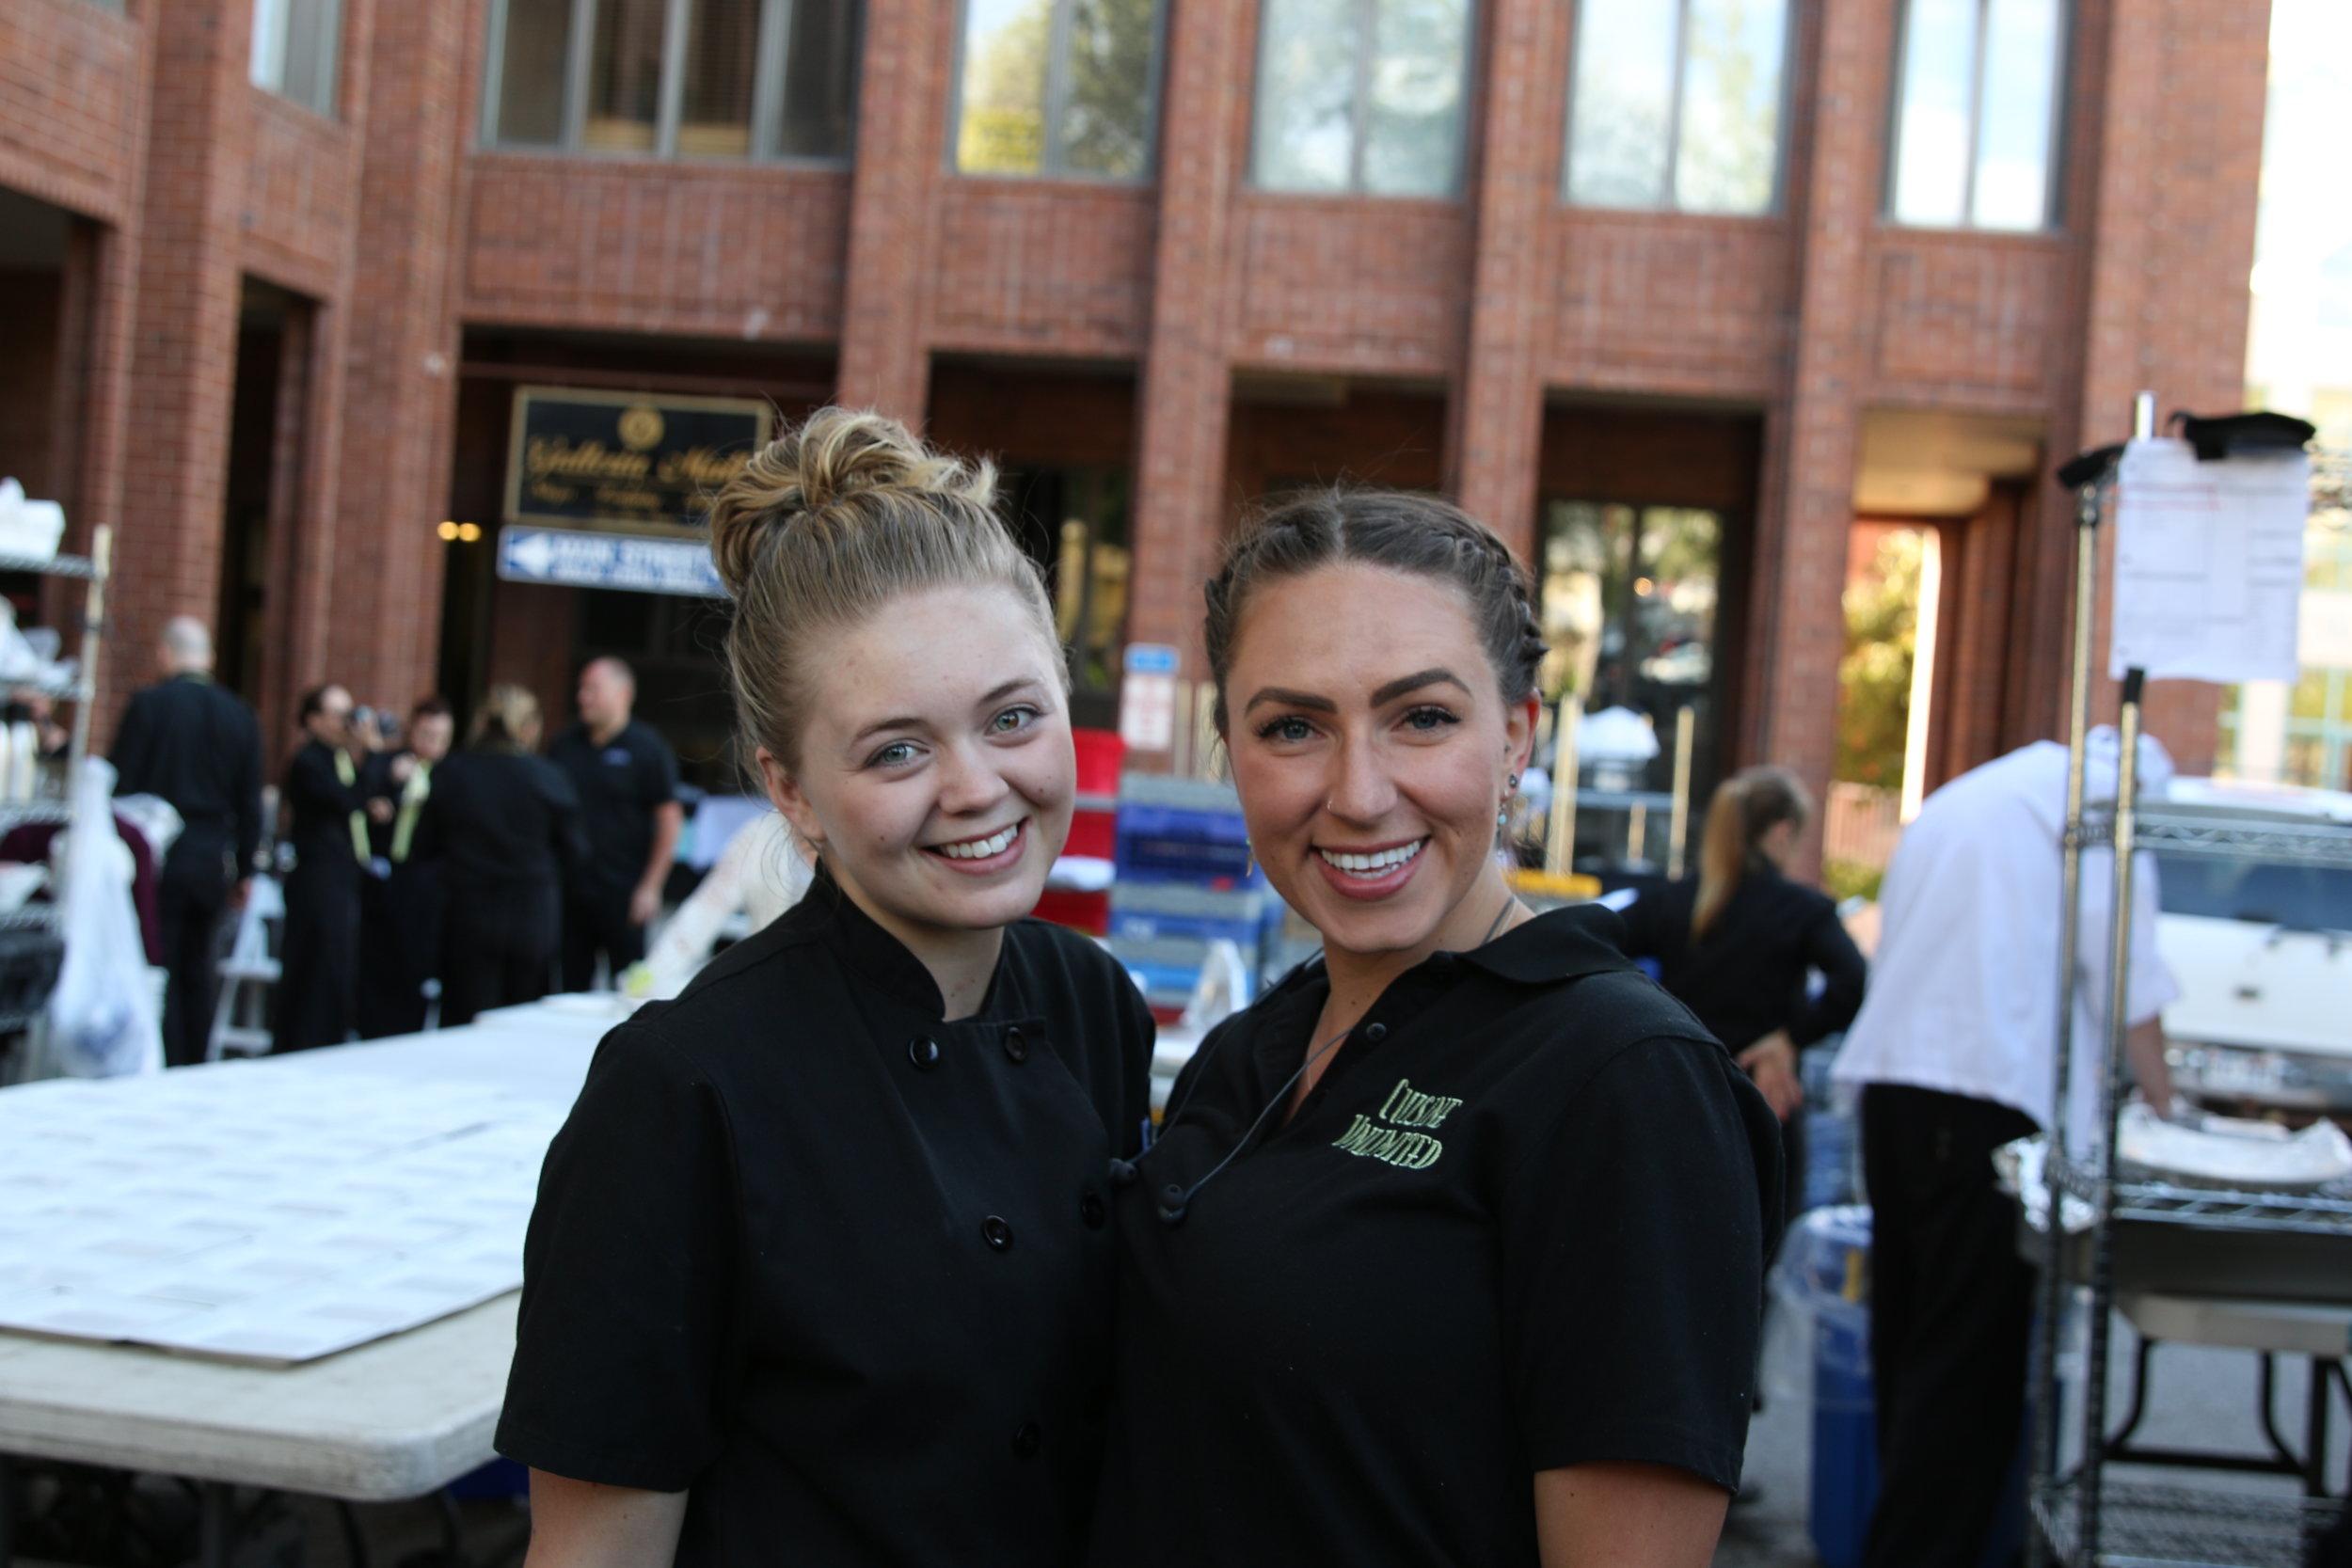 Smiling Staff